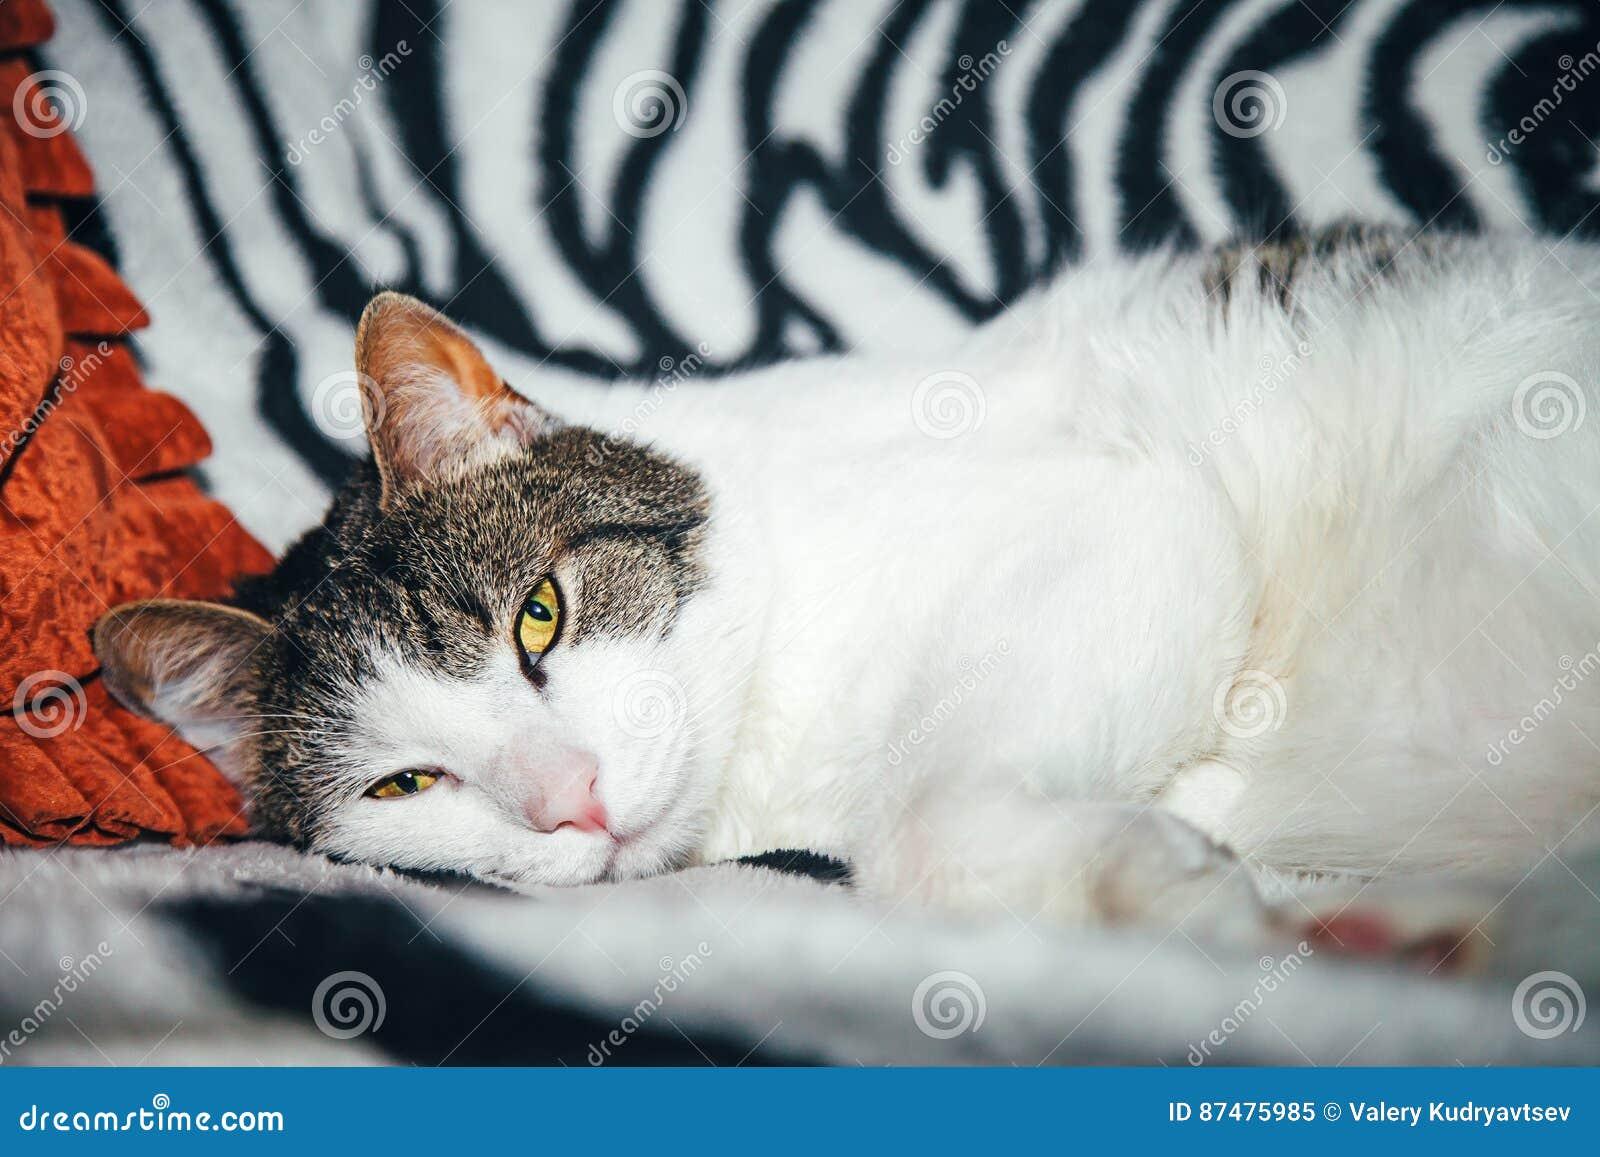 Gato blanco en fondo rayado